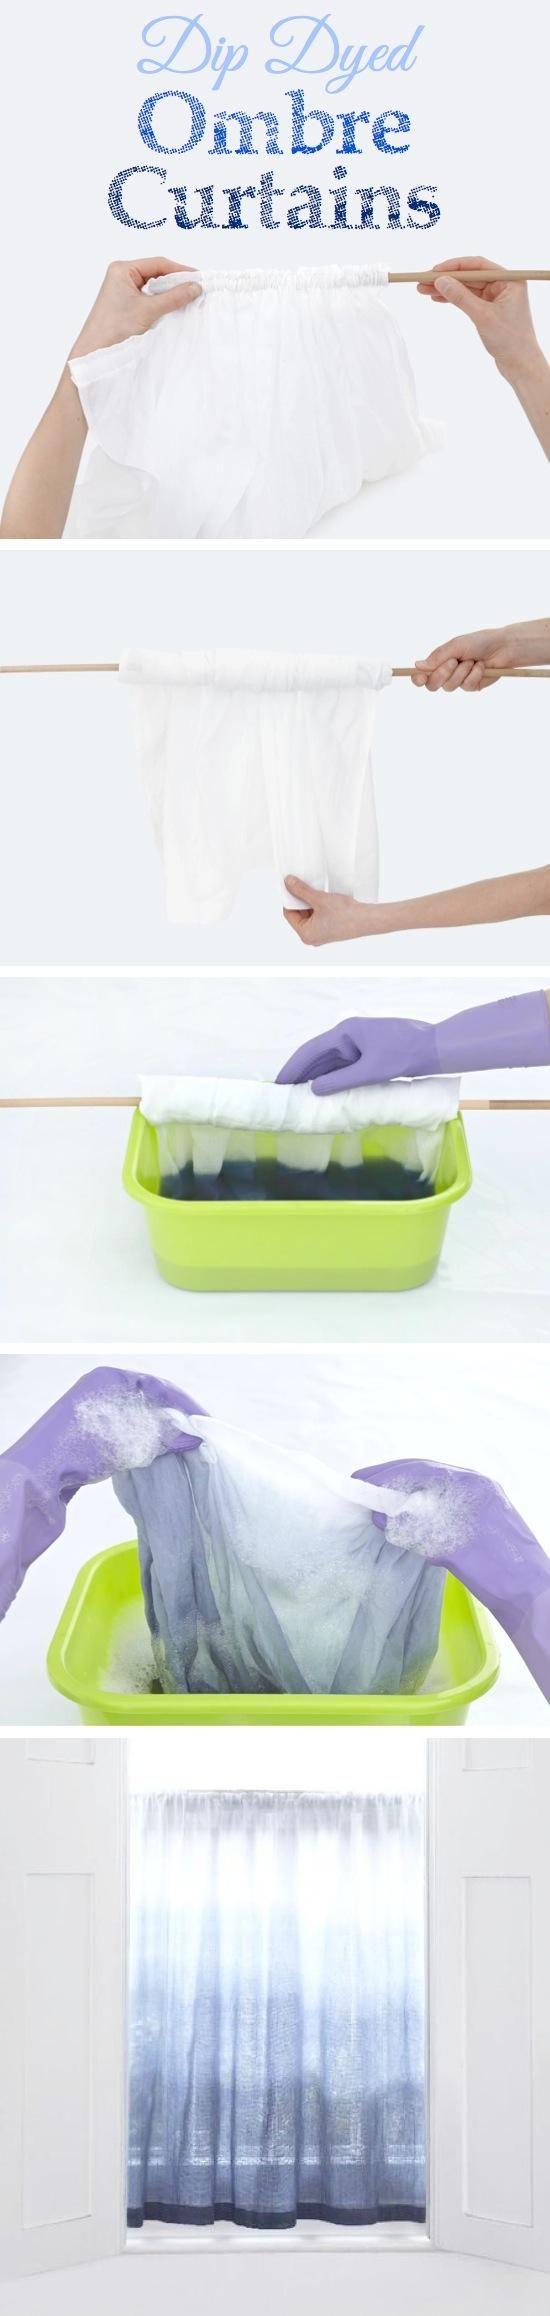 DIY Tutorial: DIY Ombre / DIY Dip Dyed Ombre Curtains - Bead&Cord